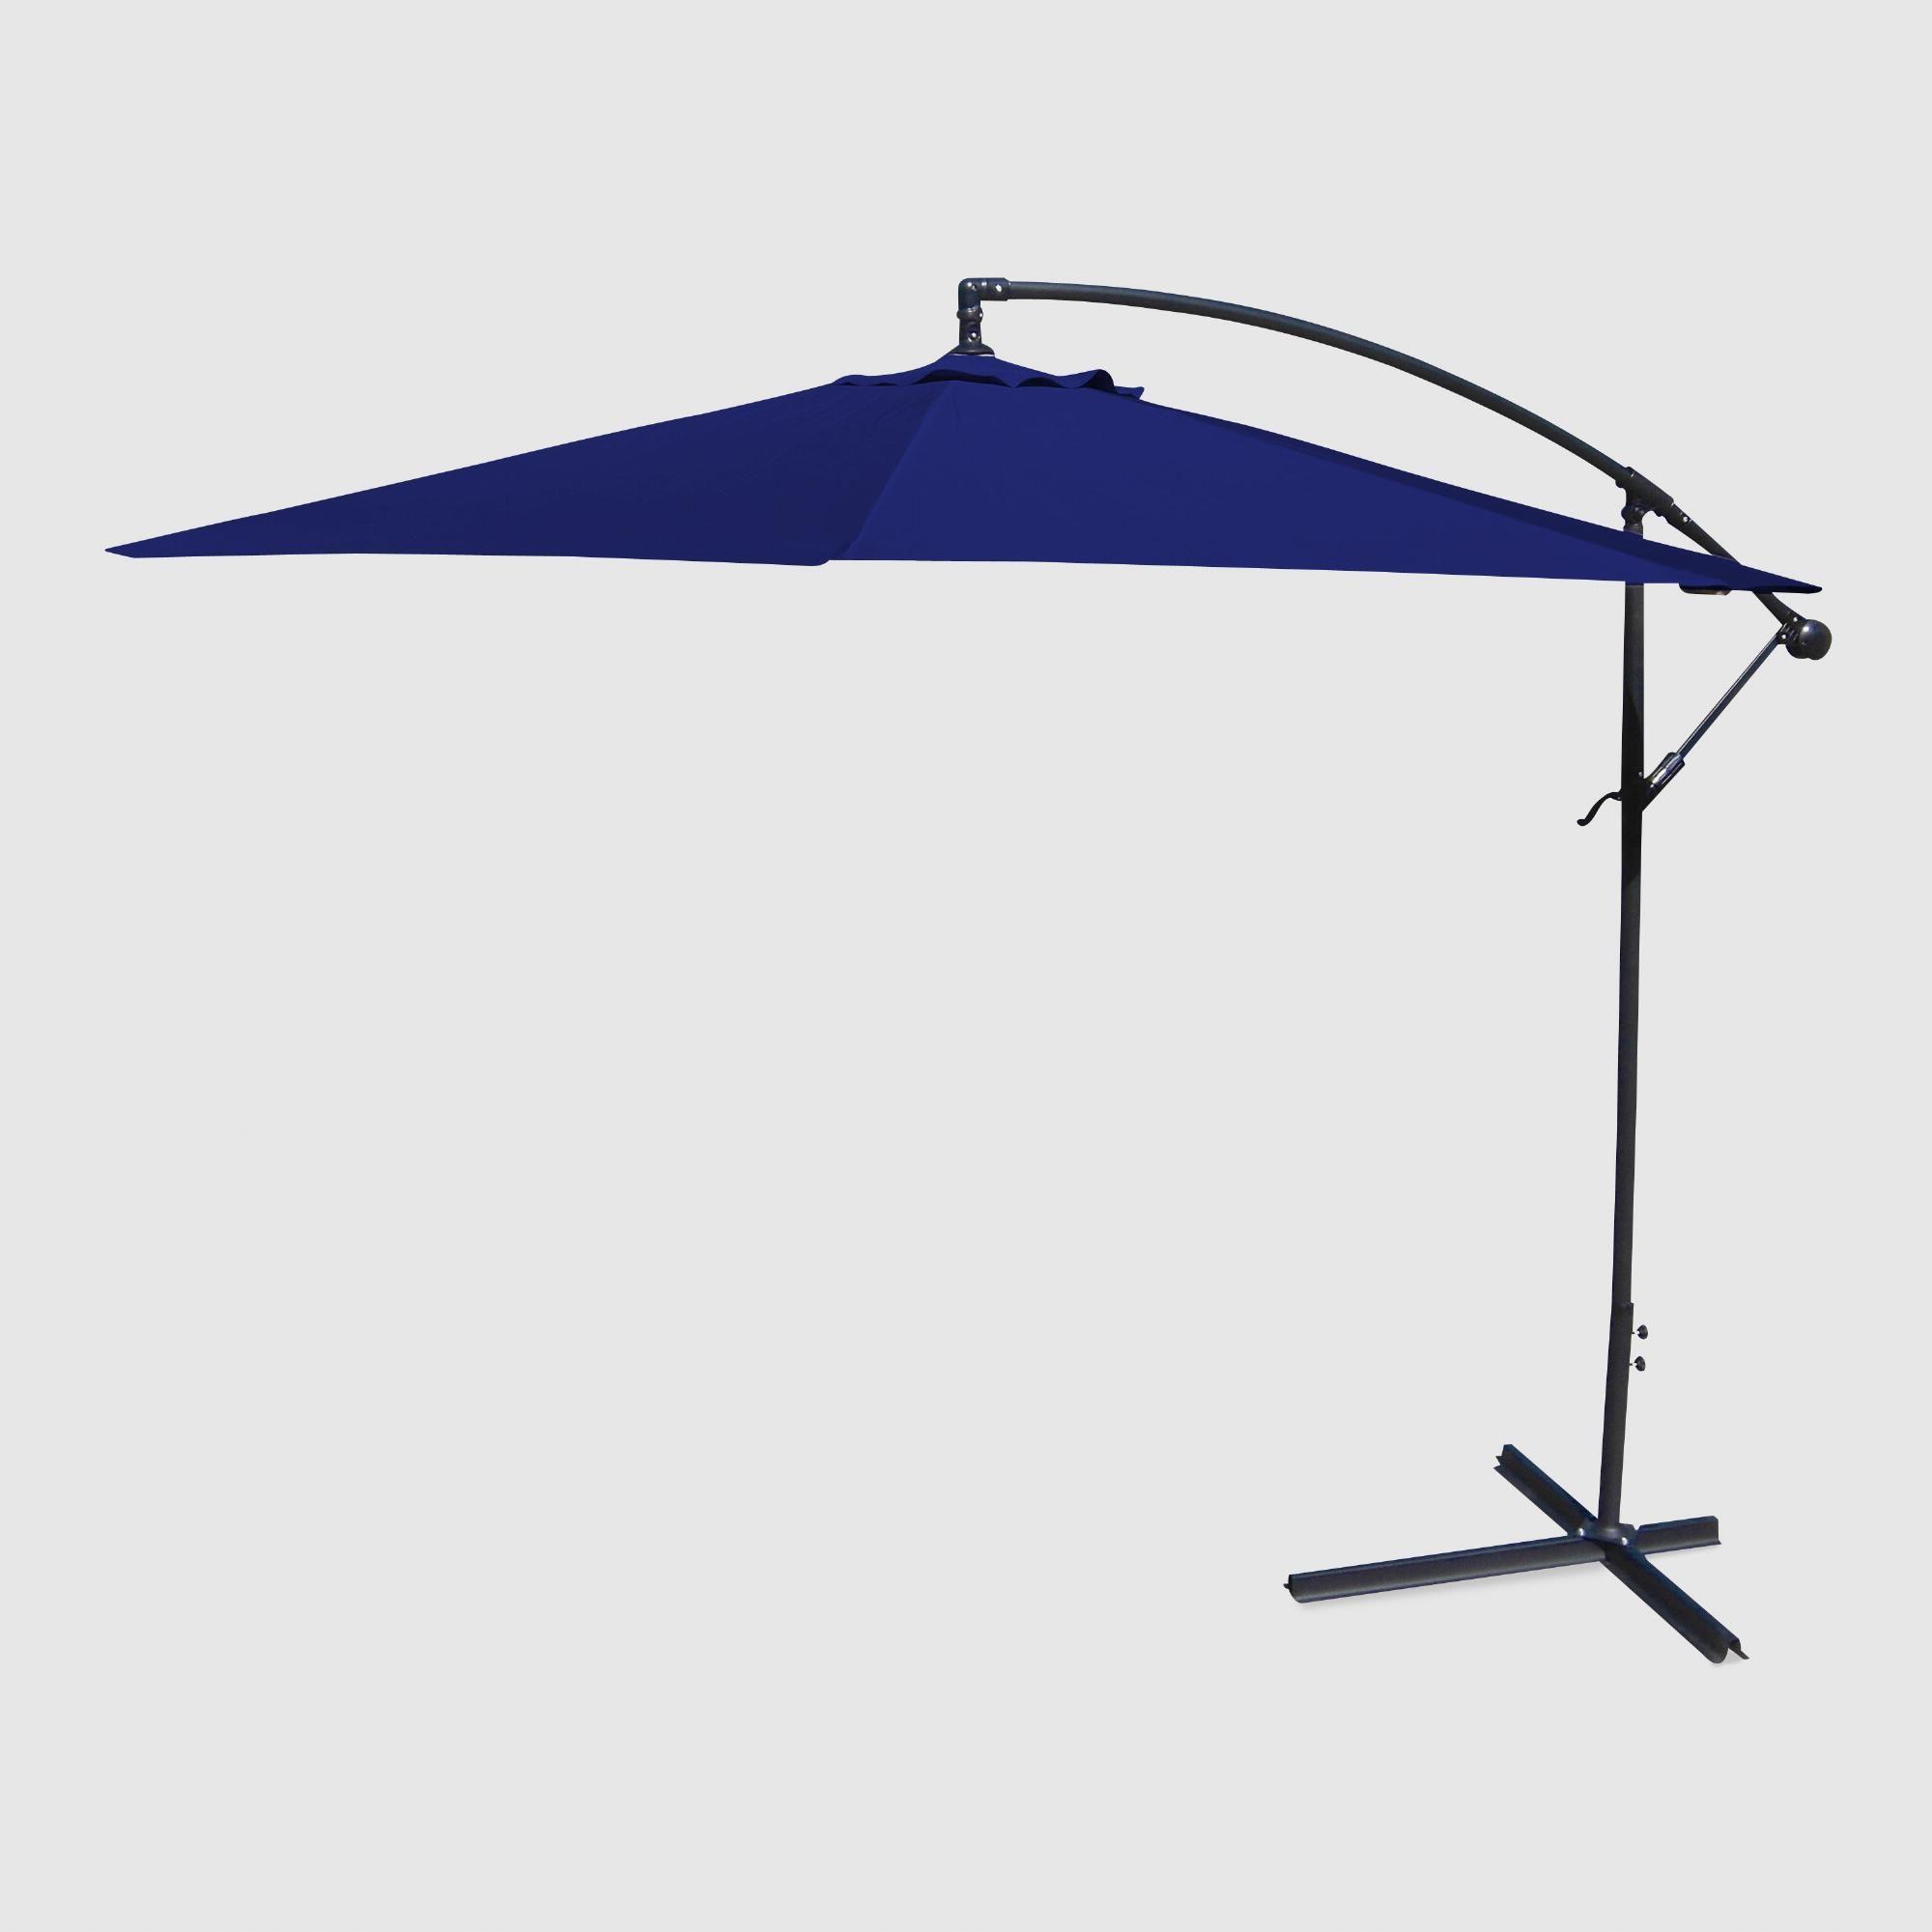 Jaelynn Cantilever Umbrellas Regarding Most Recent Navy Blue Cantilever Outdoor Patio Umbrella – Fabricworld Market (View 20 of 20)